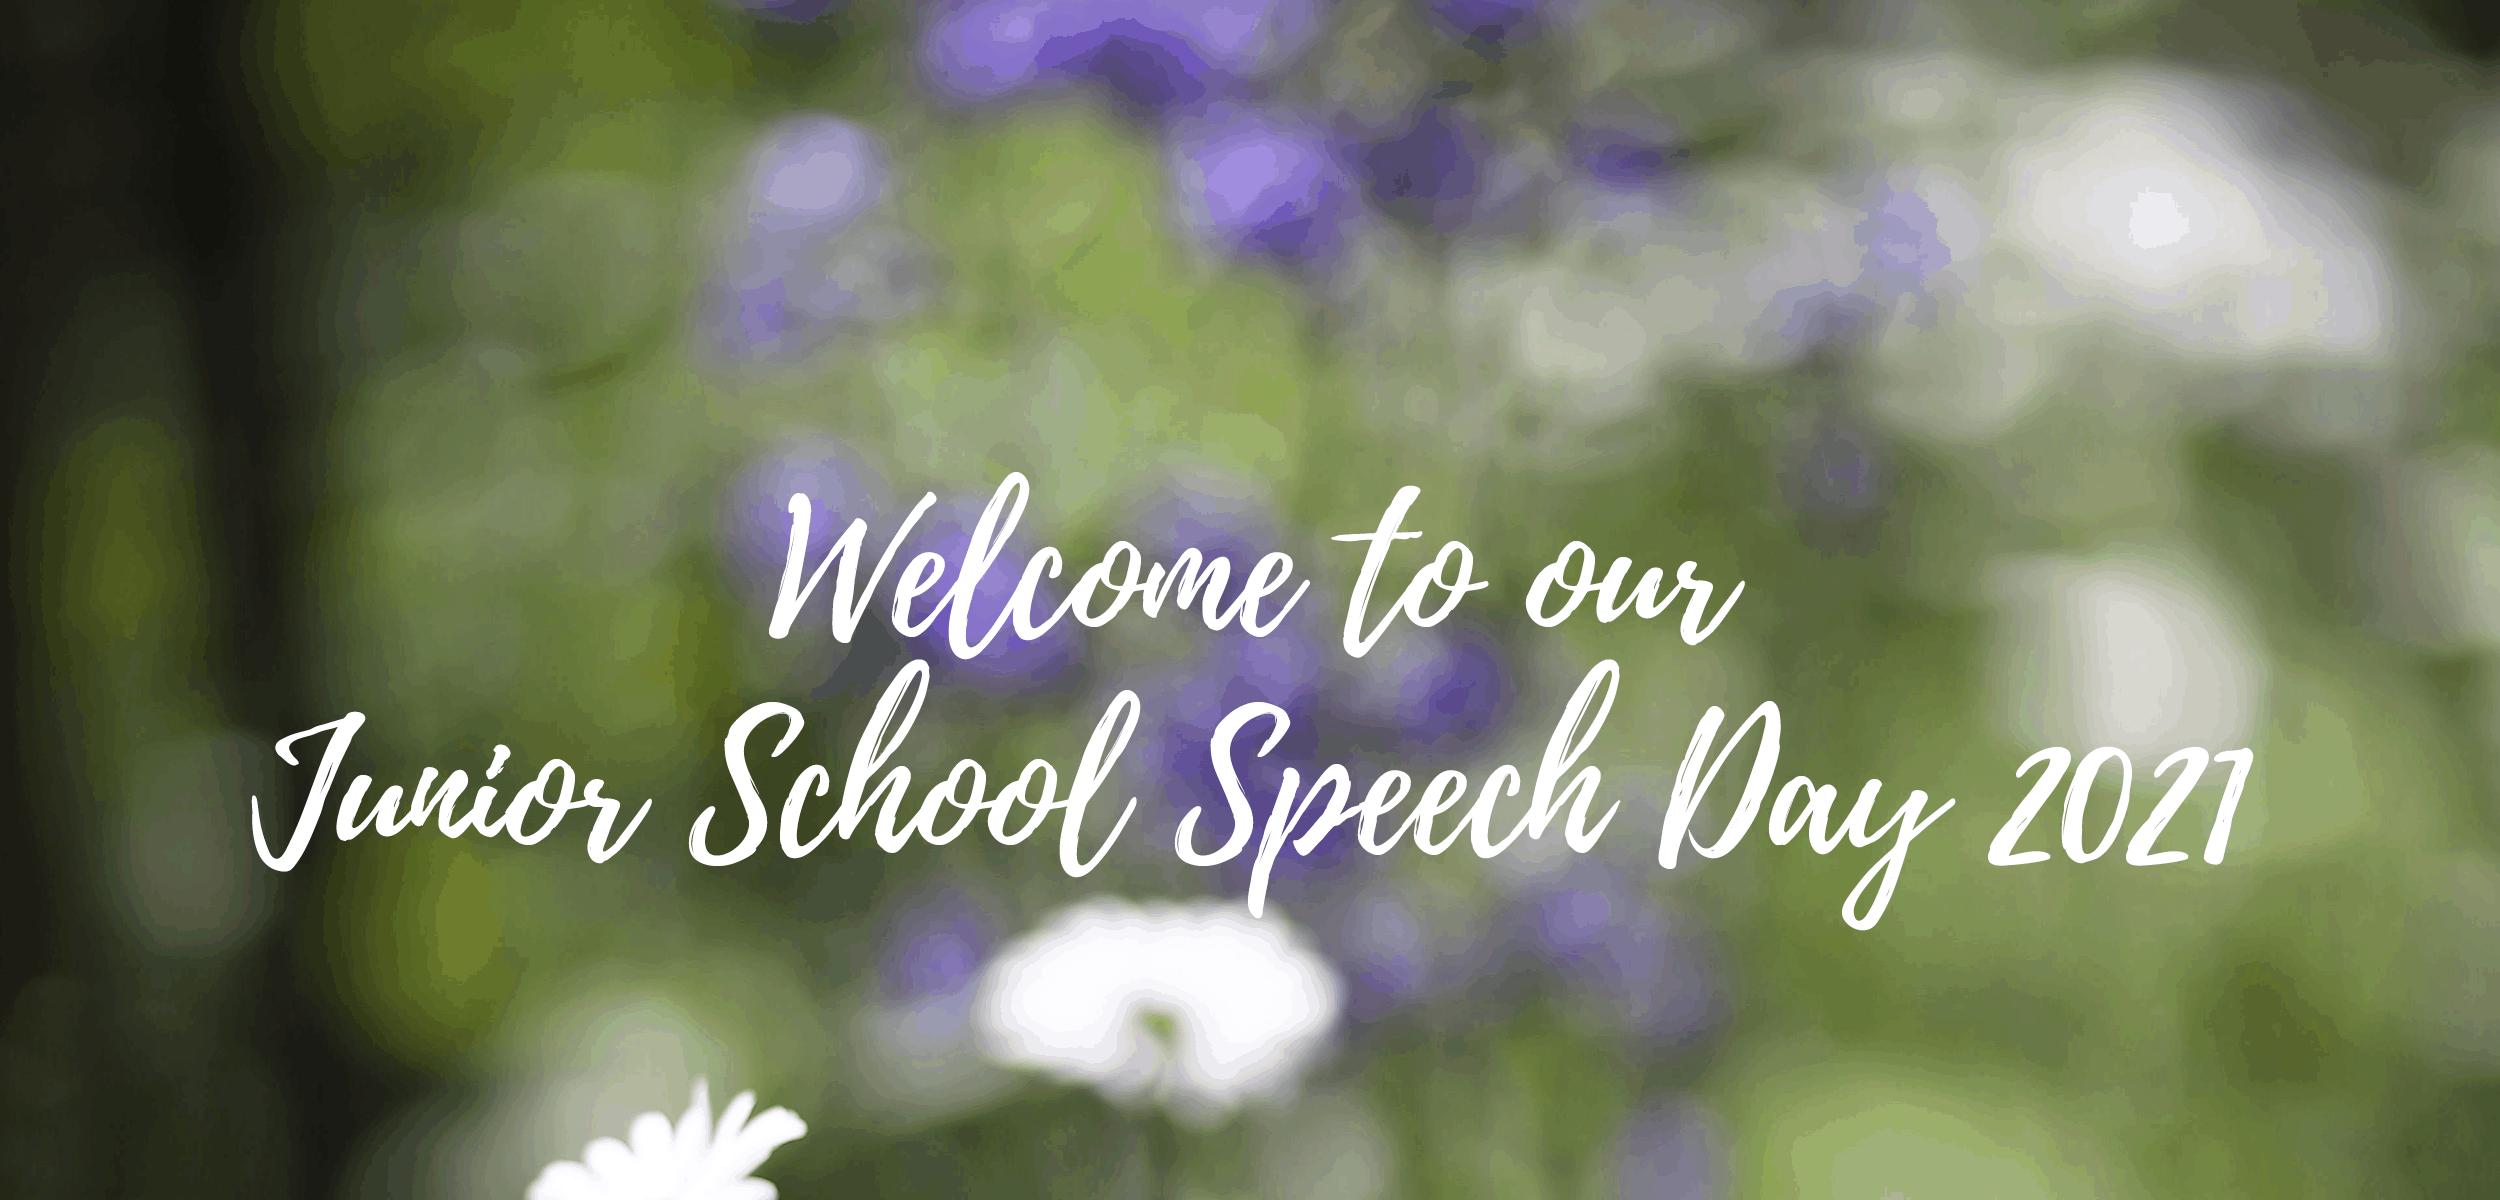 Junior School Speech Day Cover